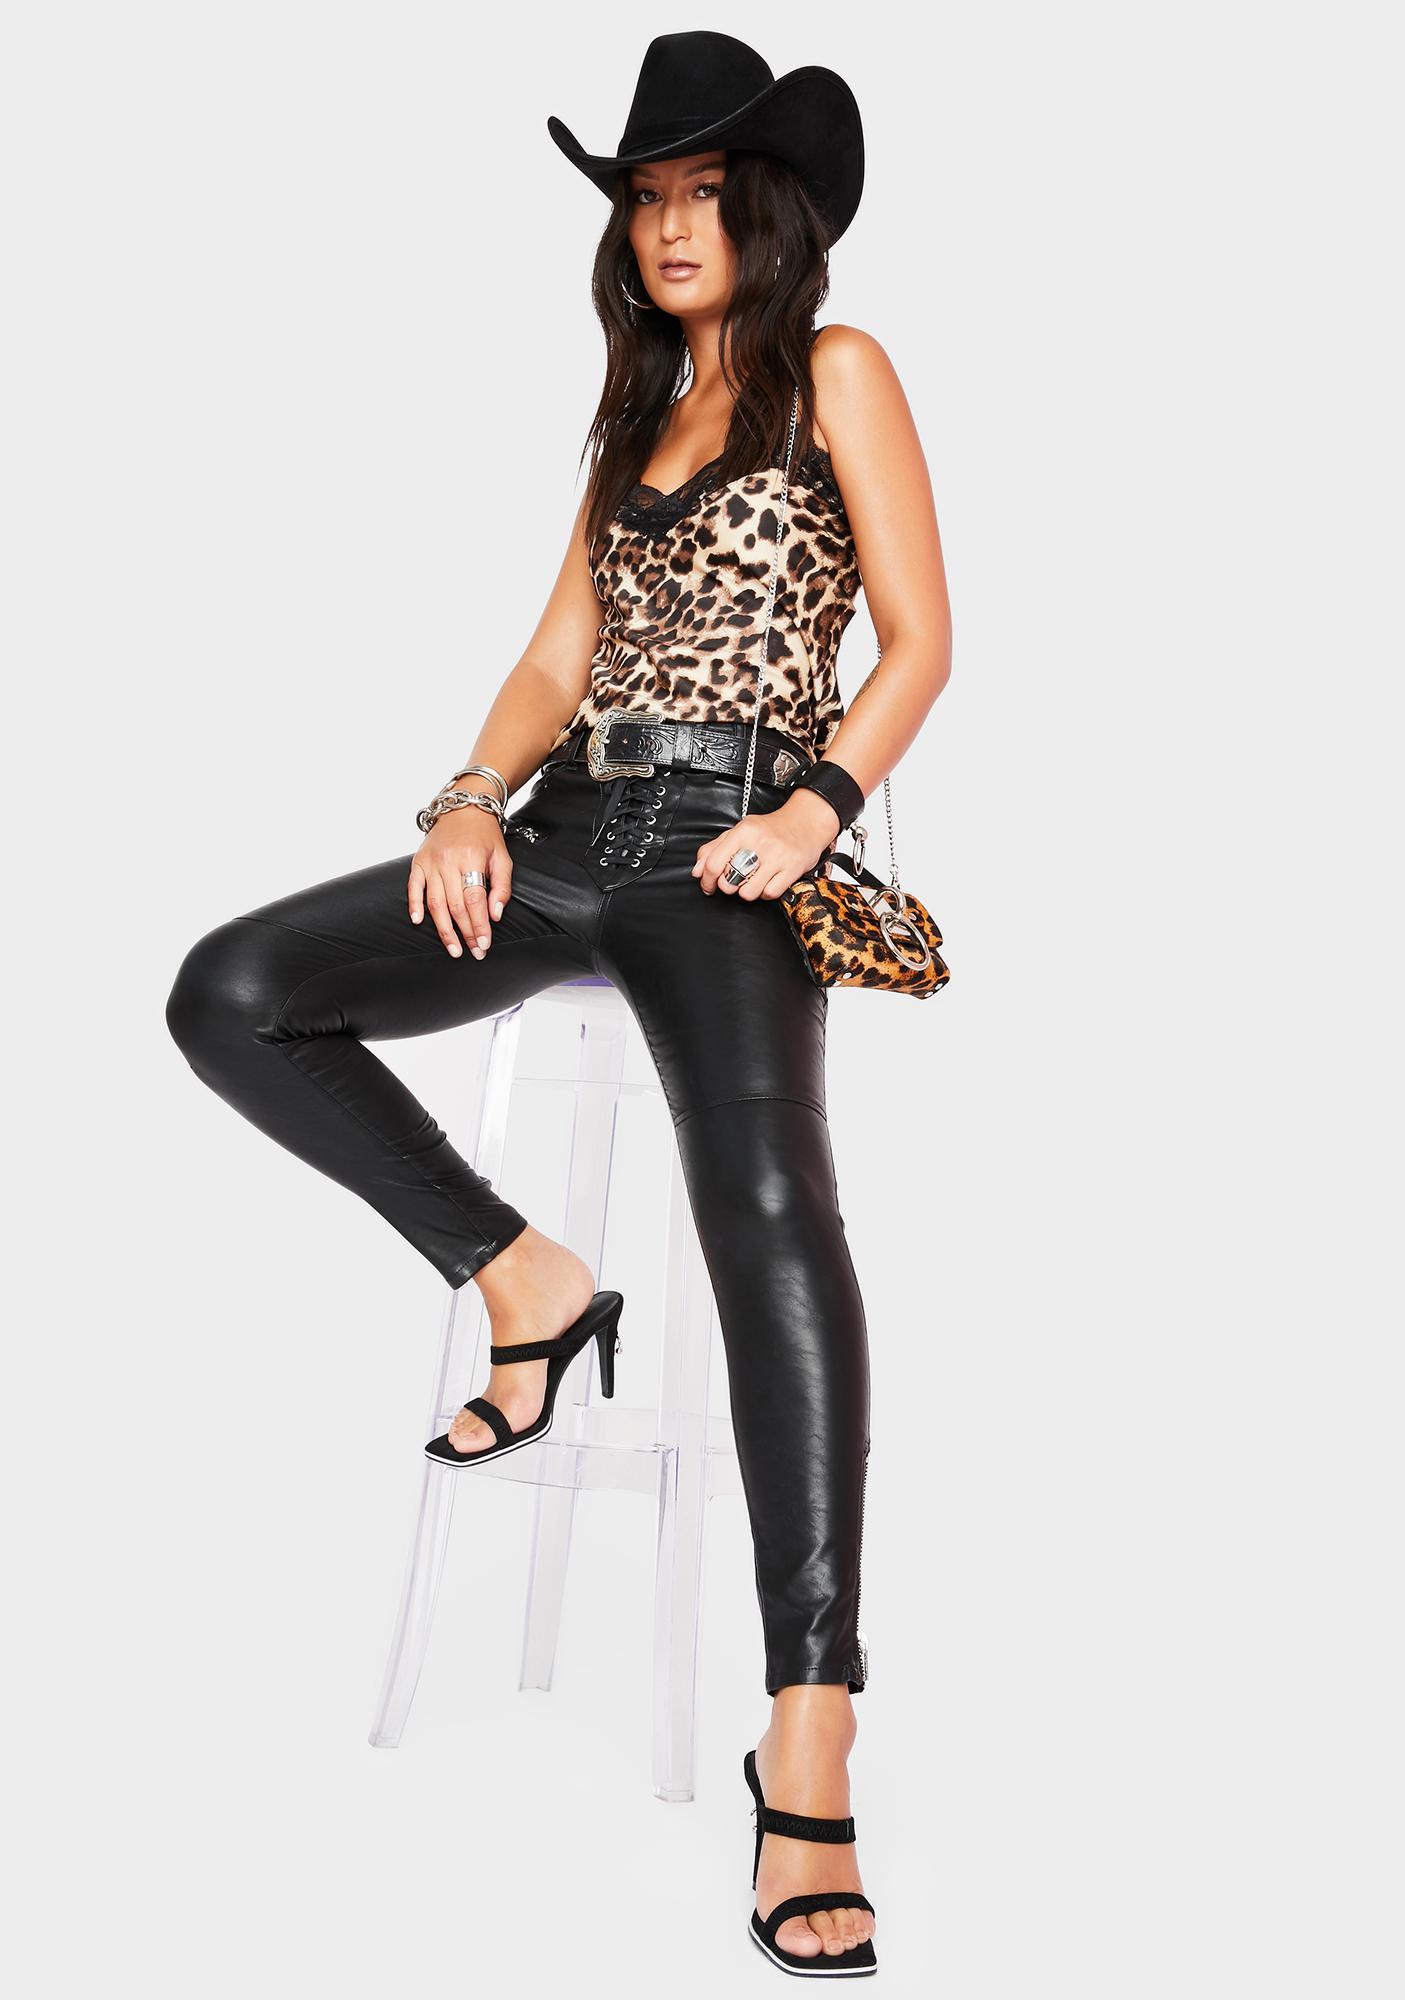 SWNY Cheetah 90s Lace Slip Top